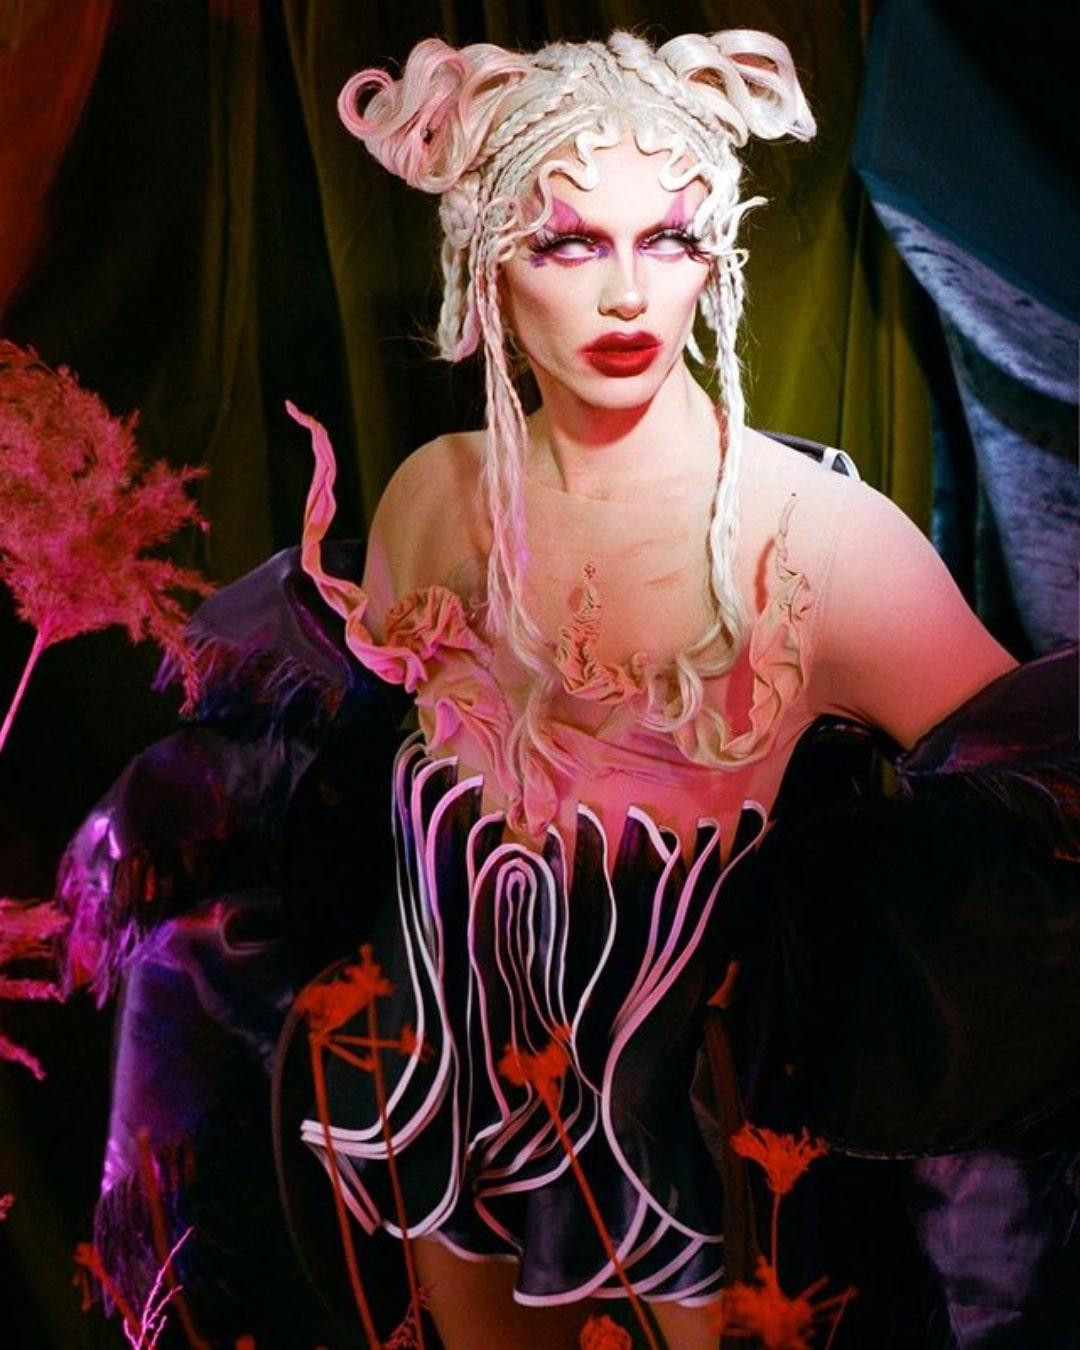 Conoce a Bimini Bon Boulash, la icónica drag queen no binaria, vegana y estrella de RuPaul's Drag Race UK